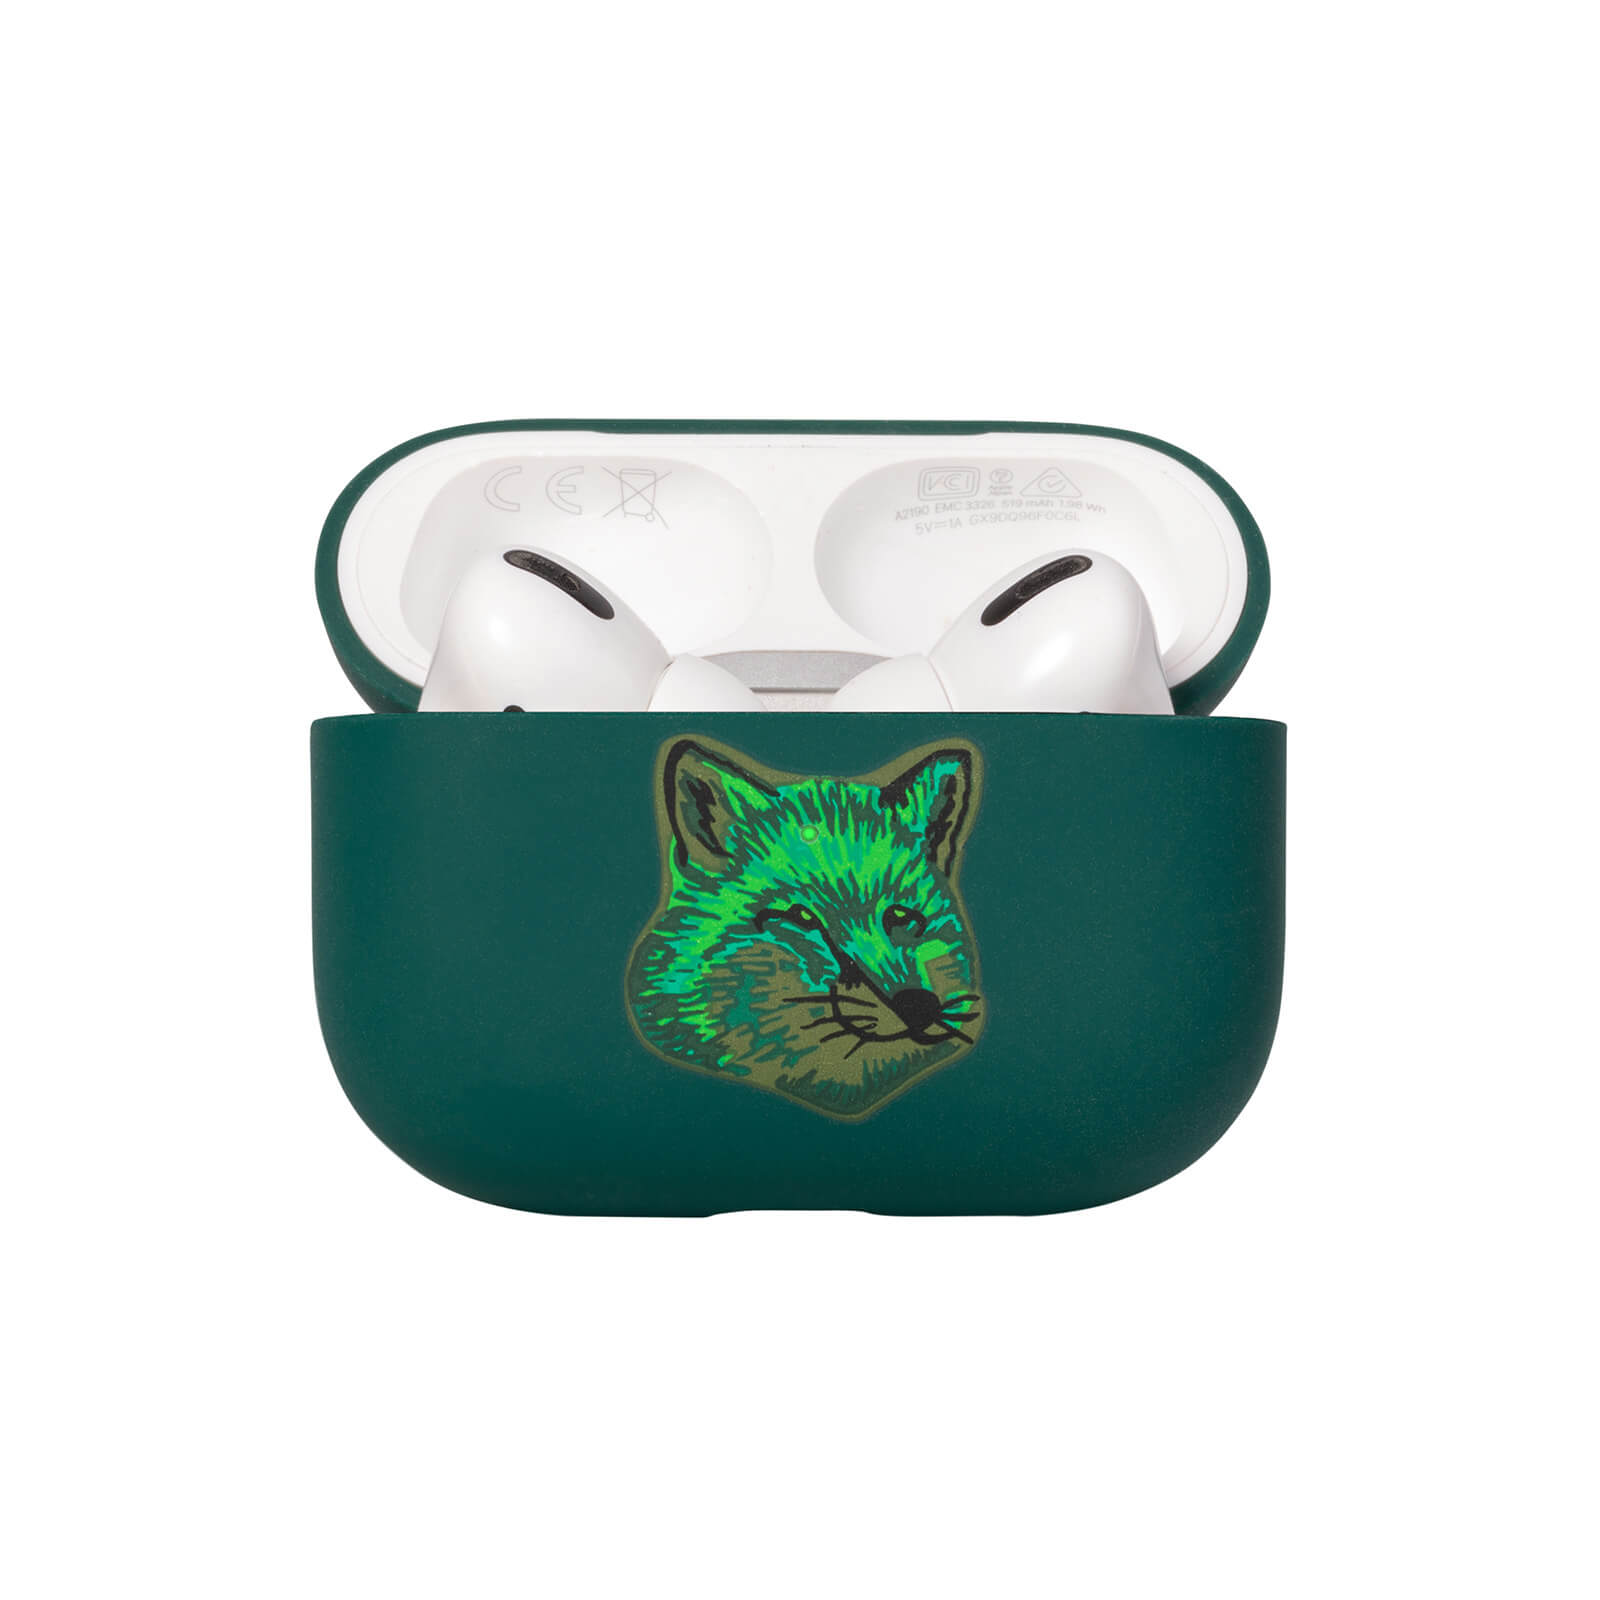 Native Union x Maison Kitsuné Cool Tone Fox Head Airpod Pro Case - Green